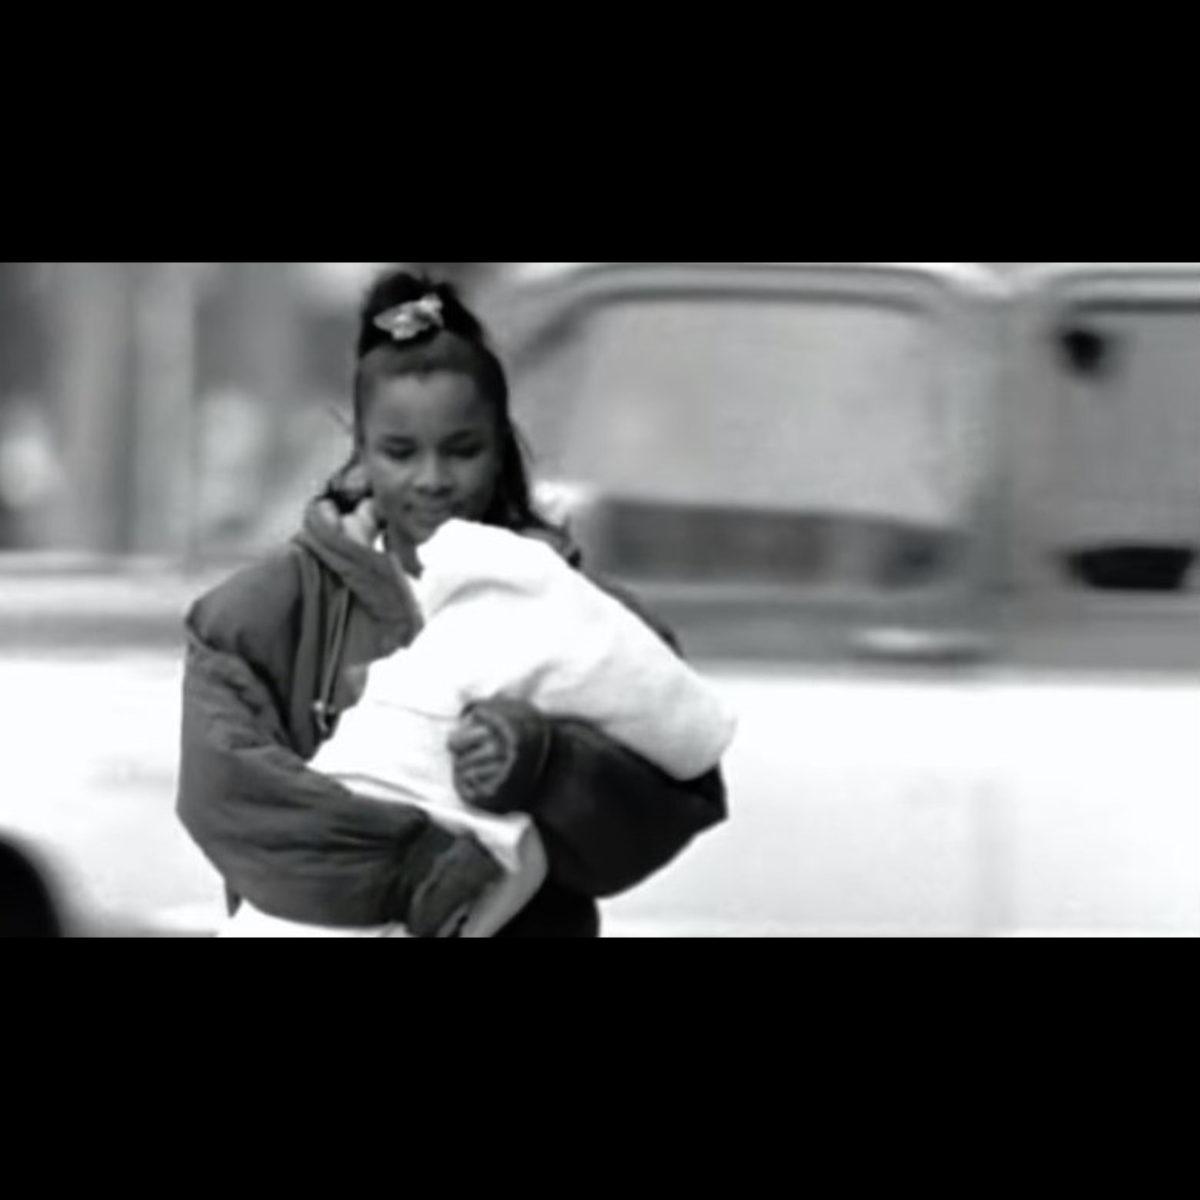 2Pac - Brenda's Got A Baby (ft. Dave Hollister) (Thumbnail)